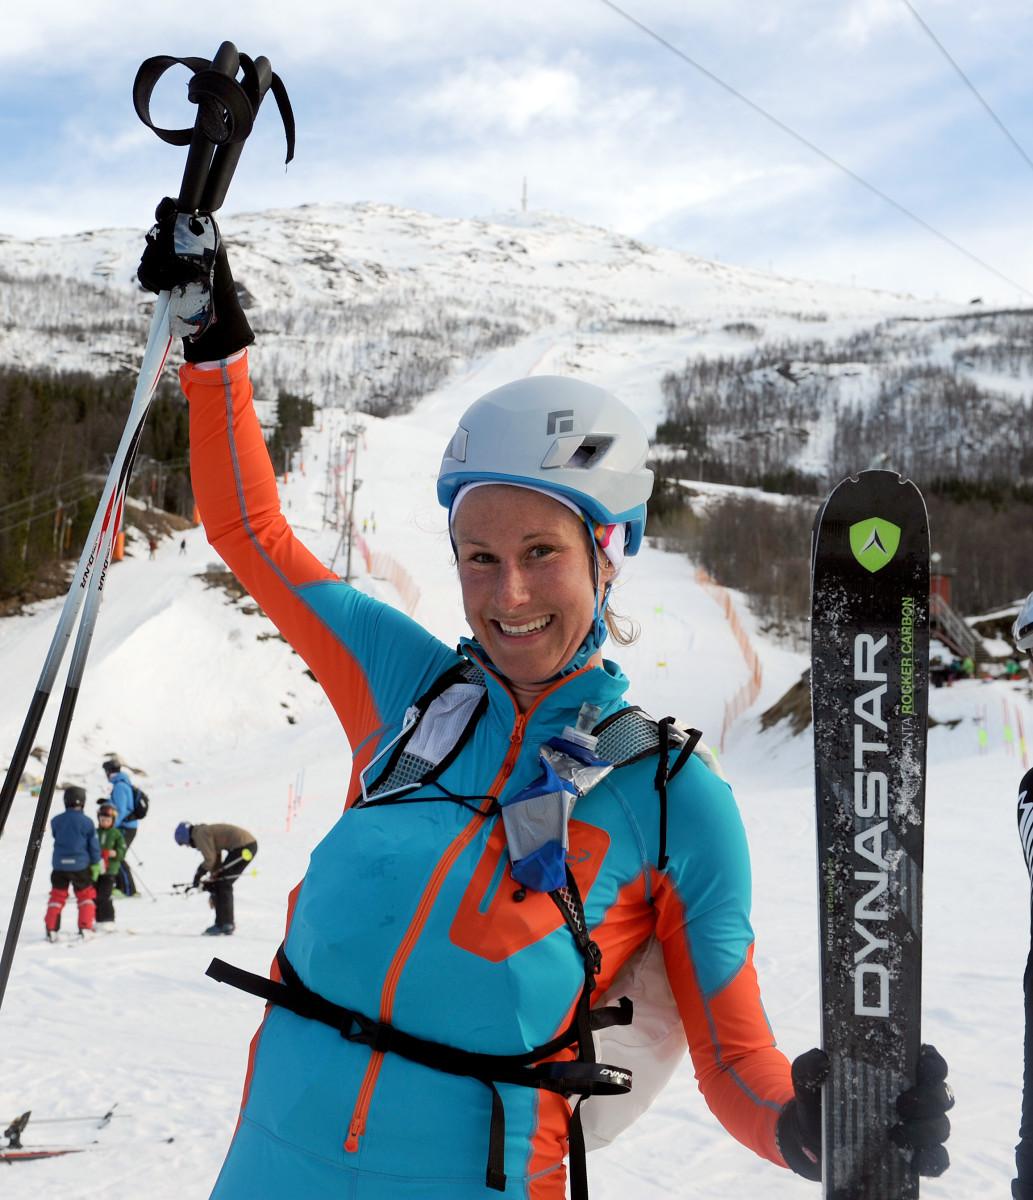 Svenske Jenny Råghall vant klasse damer elite. Foto: Rune Dahl